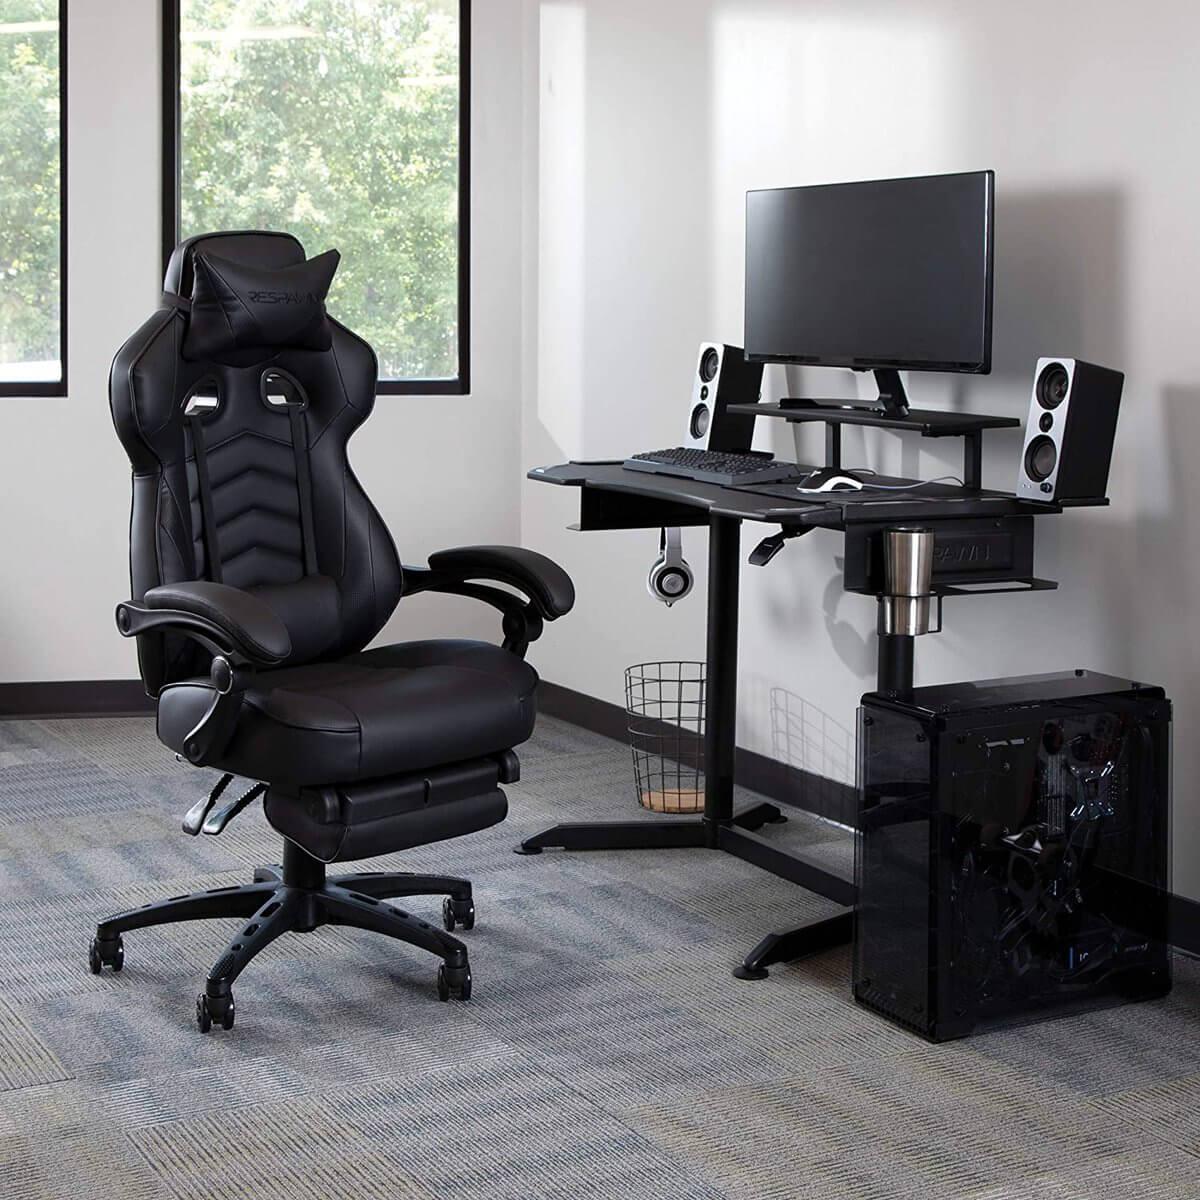 Respawn RSP 2010 gaming desk